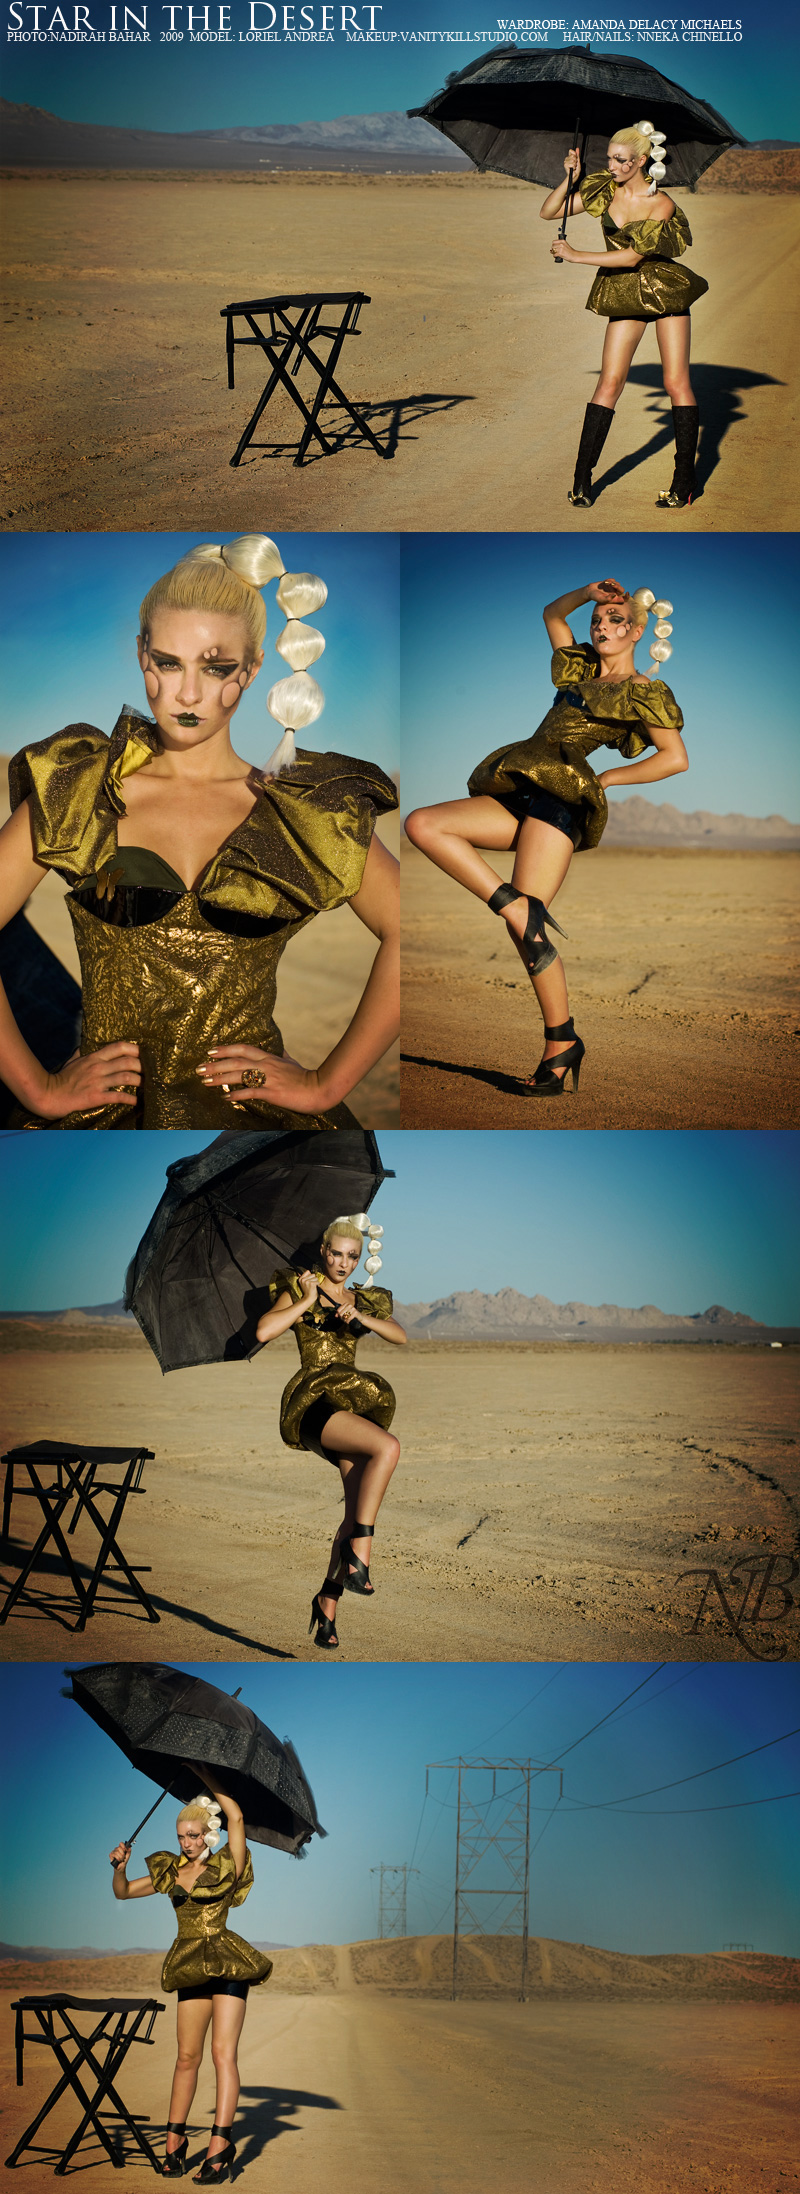 Oct 17, 2009 Rawr! Desert Life